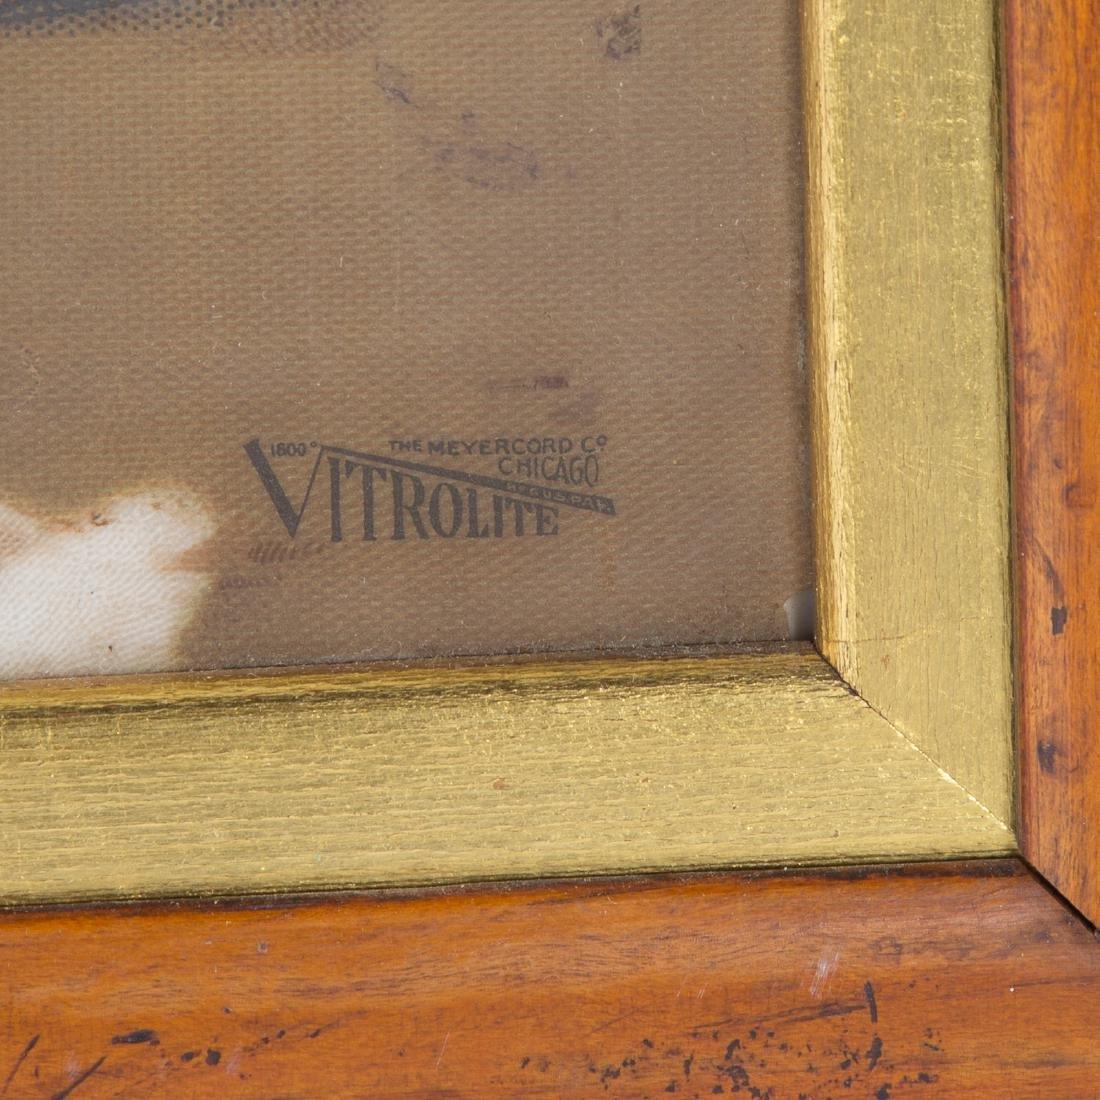 I.W. Harper Whiskey Vitrolite advertising sign - 4